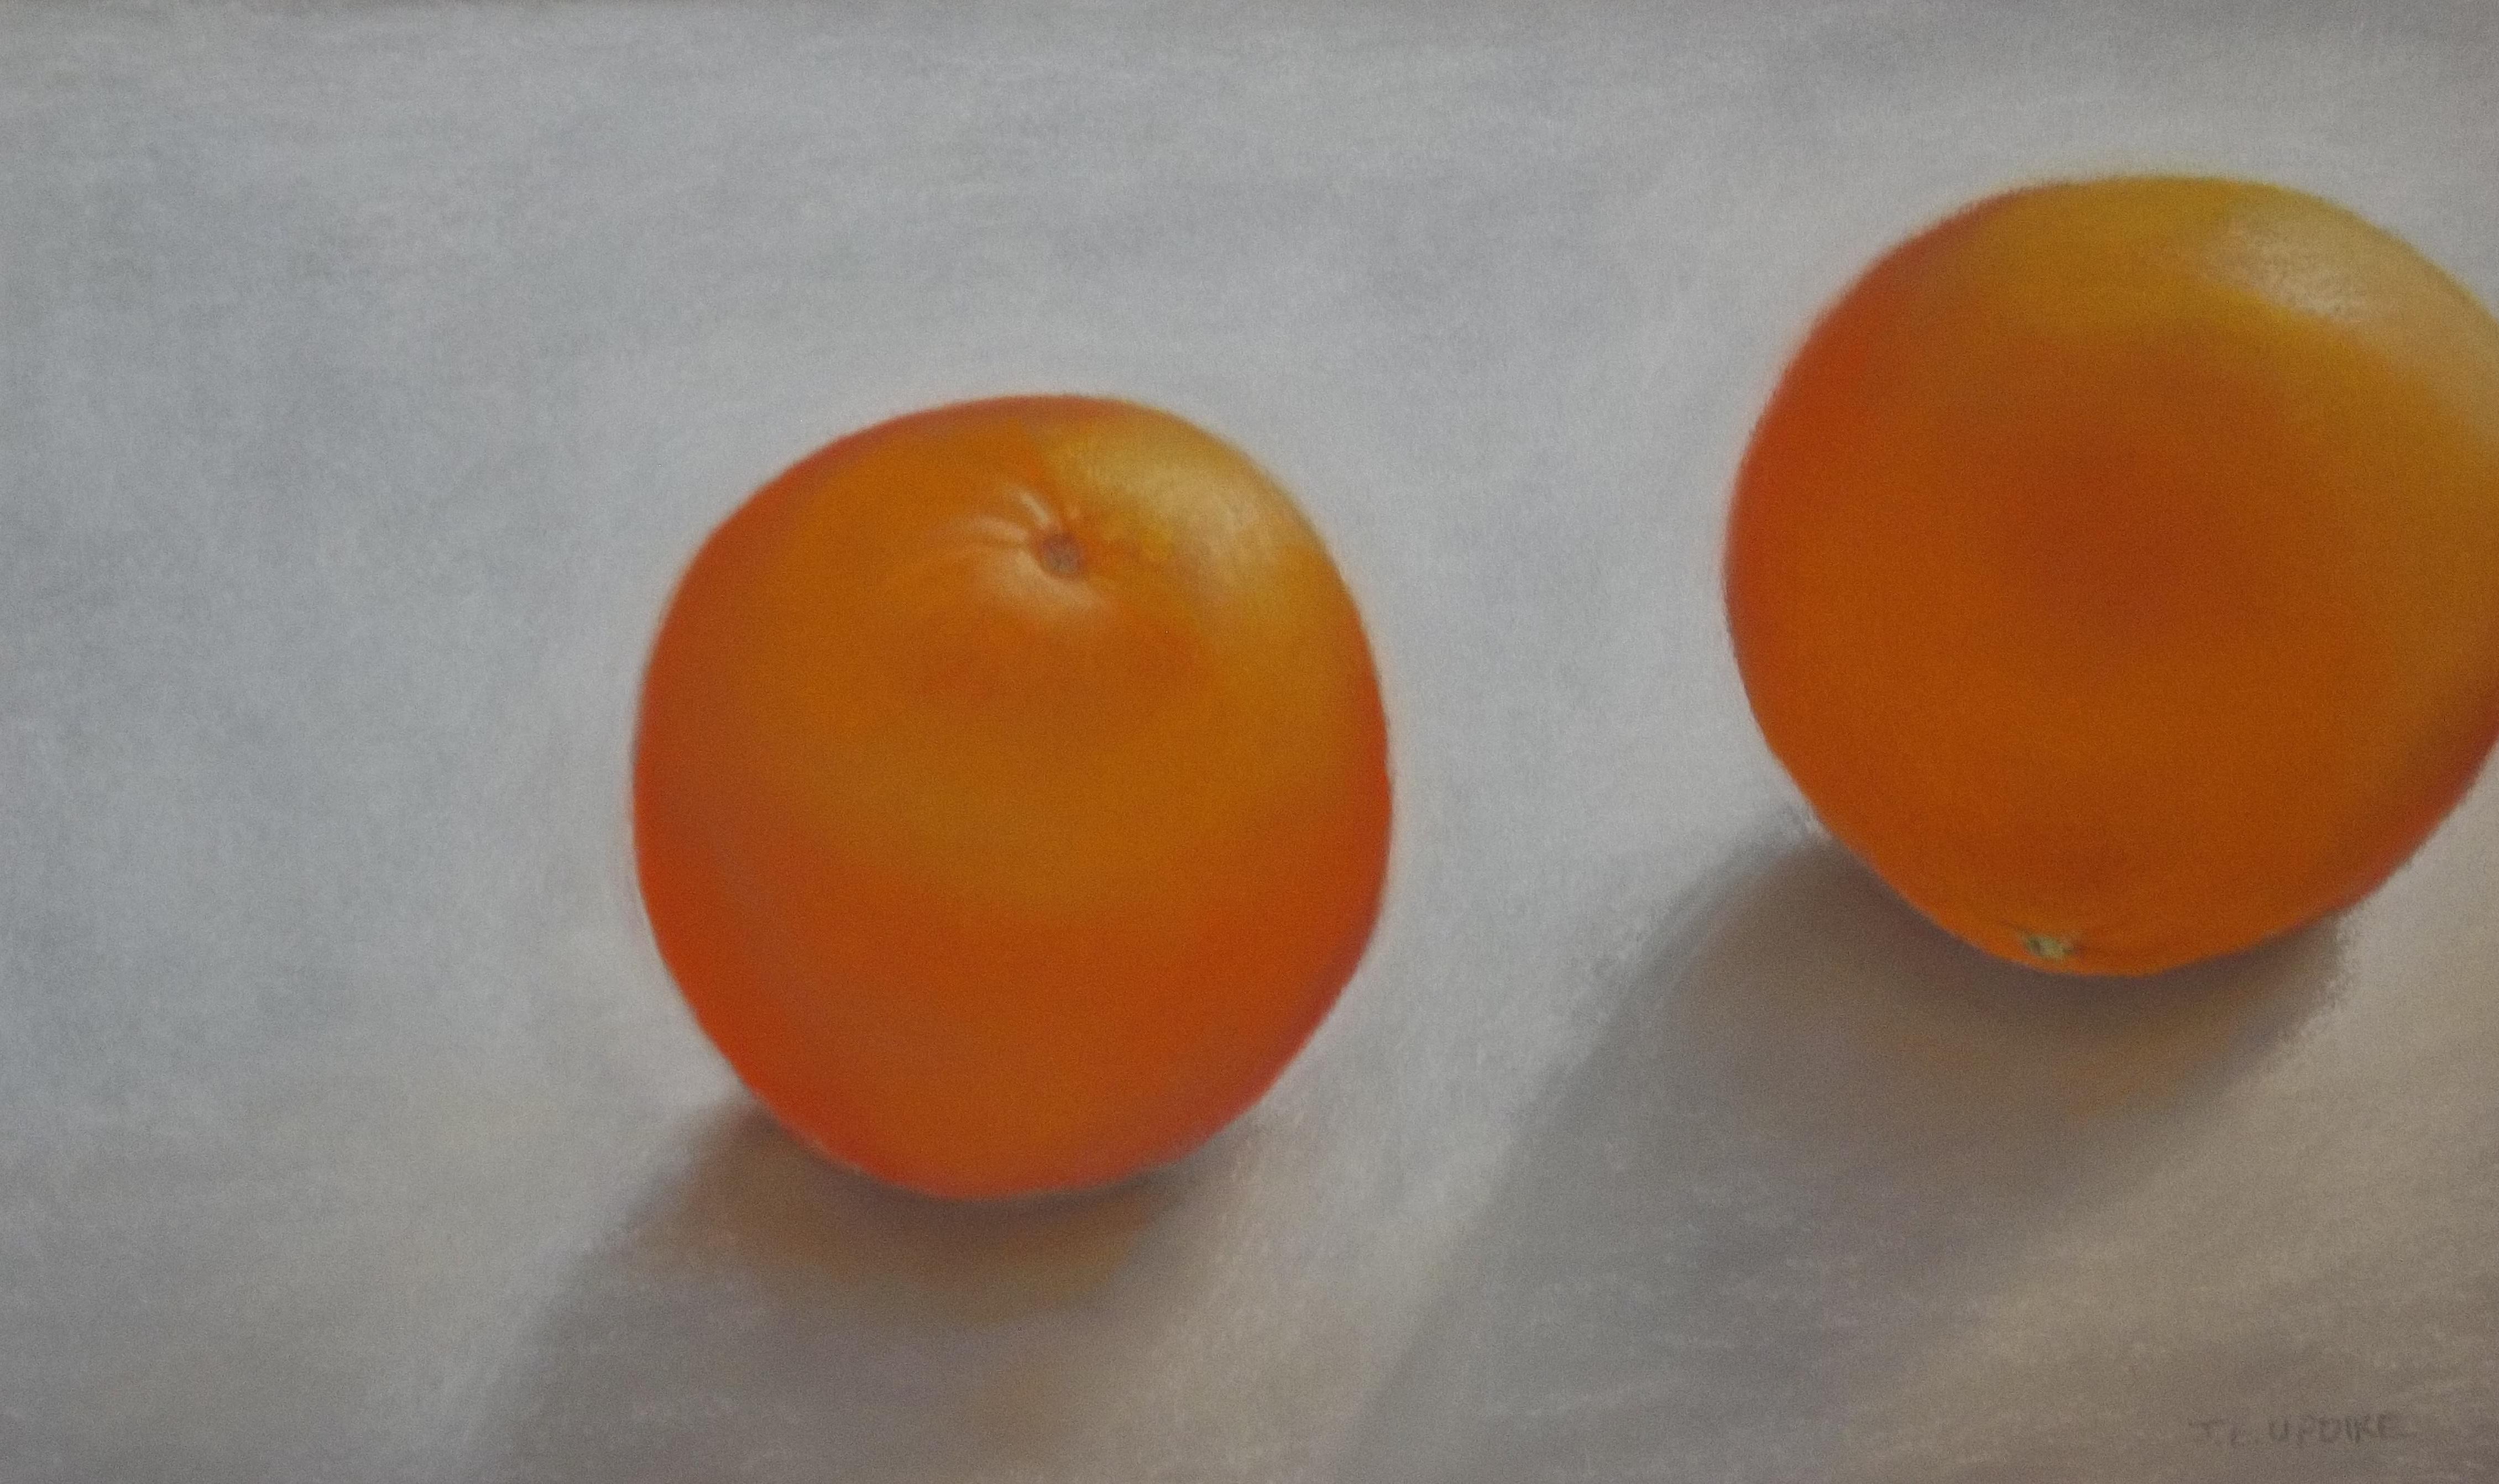 Two Navel Oranges